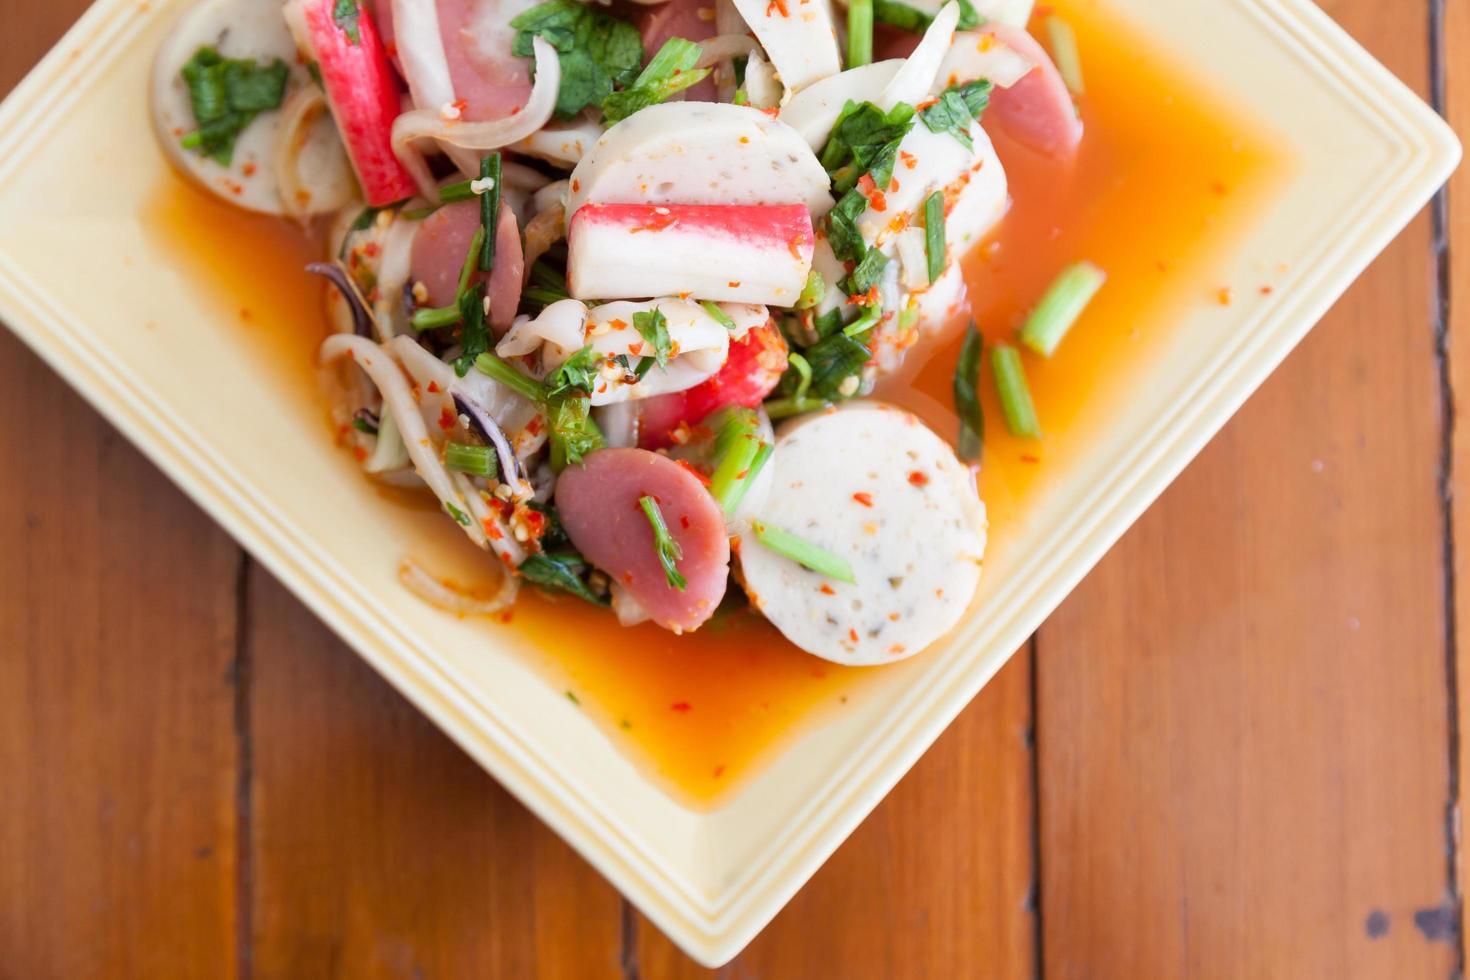 salade thaïlandaise épicée photo